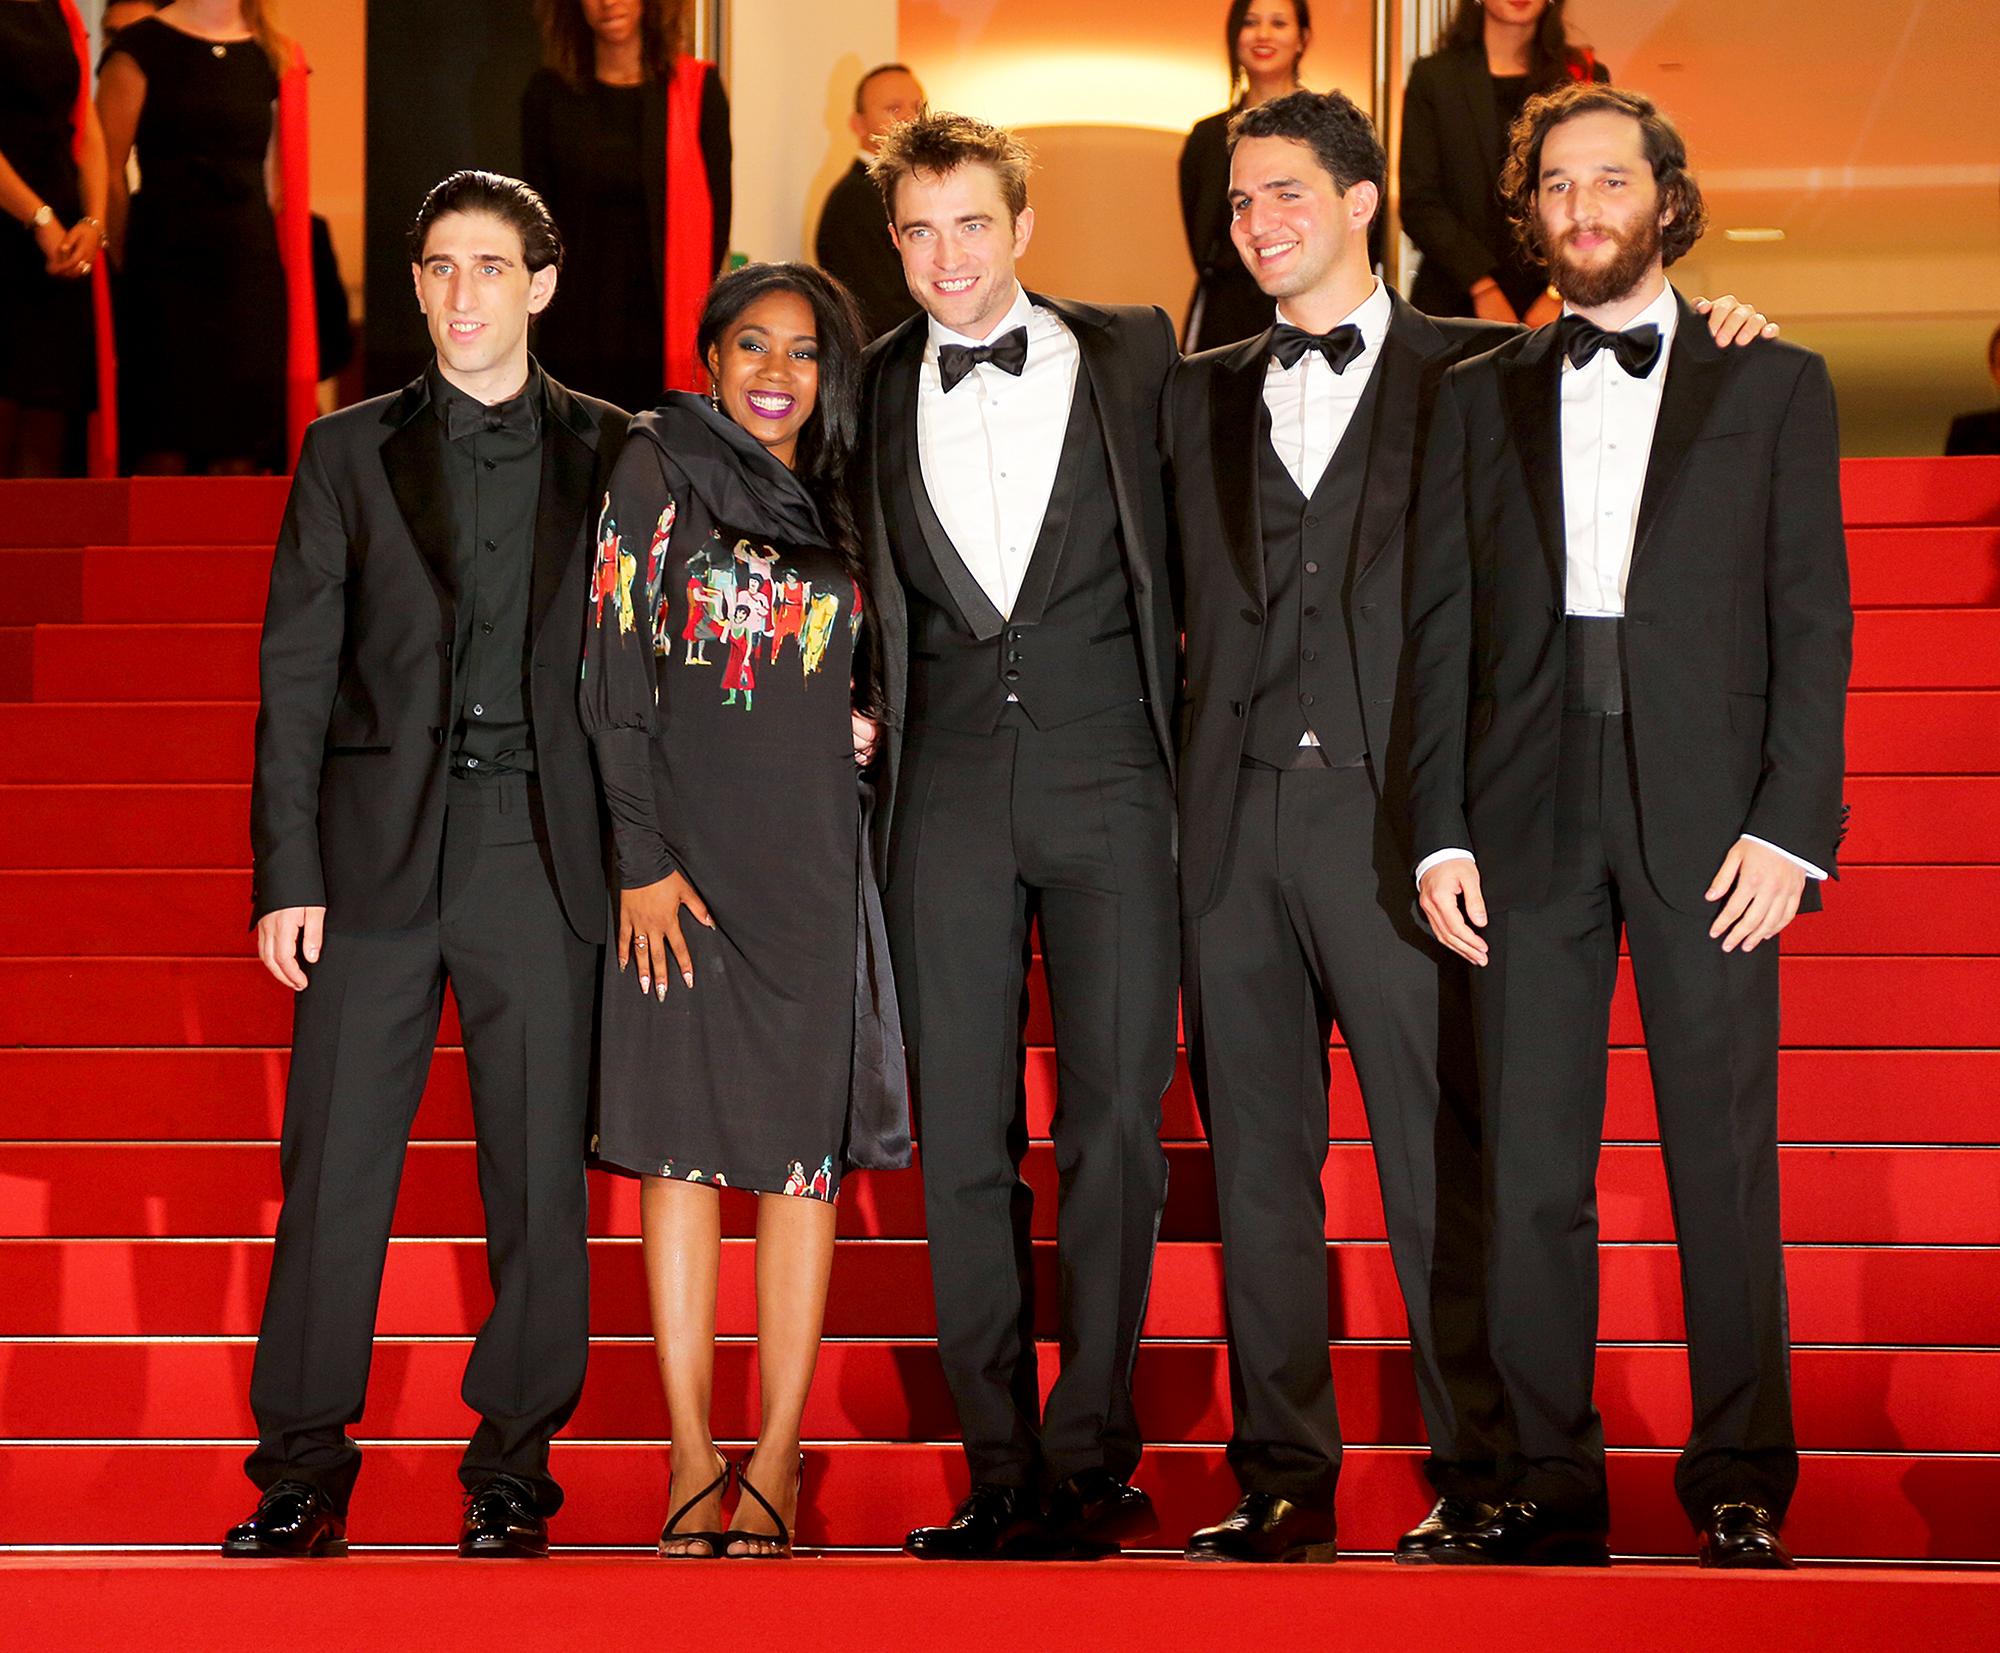 Joshua Safdie, Robert Pattinson, Ben Safdie, Buddy Duress and Taliah Webster